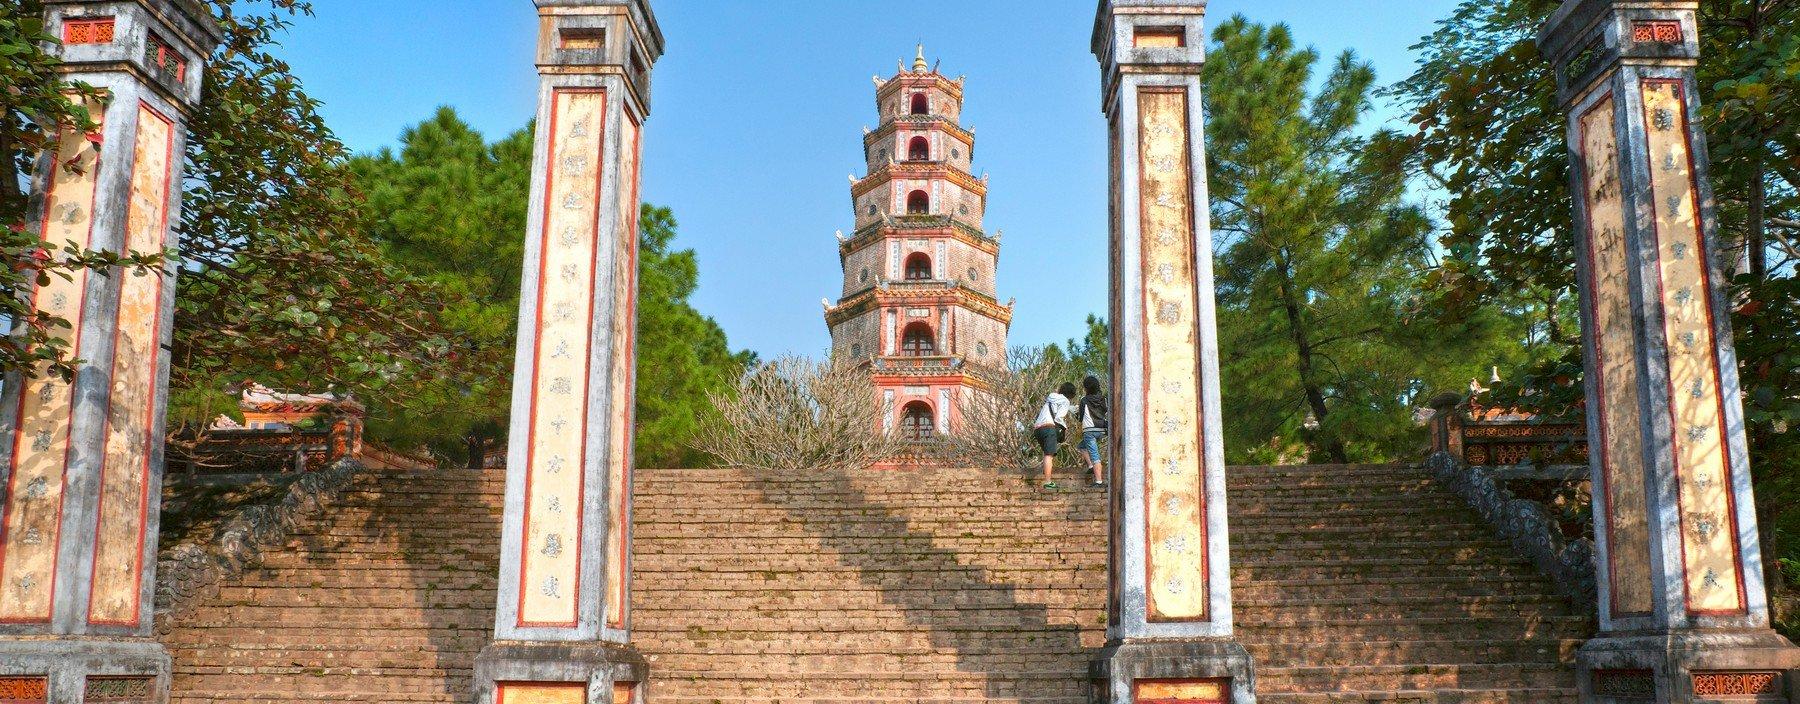 vn, hue, thien mu pagoda  (2).jpg